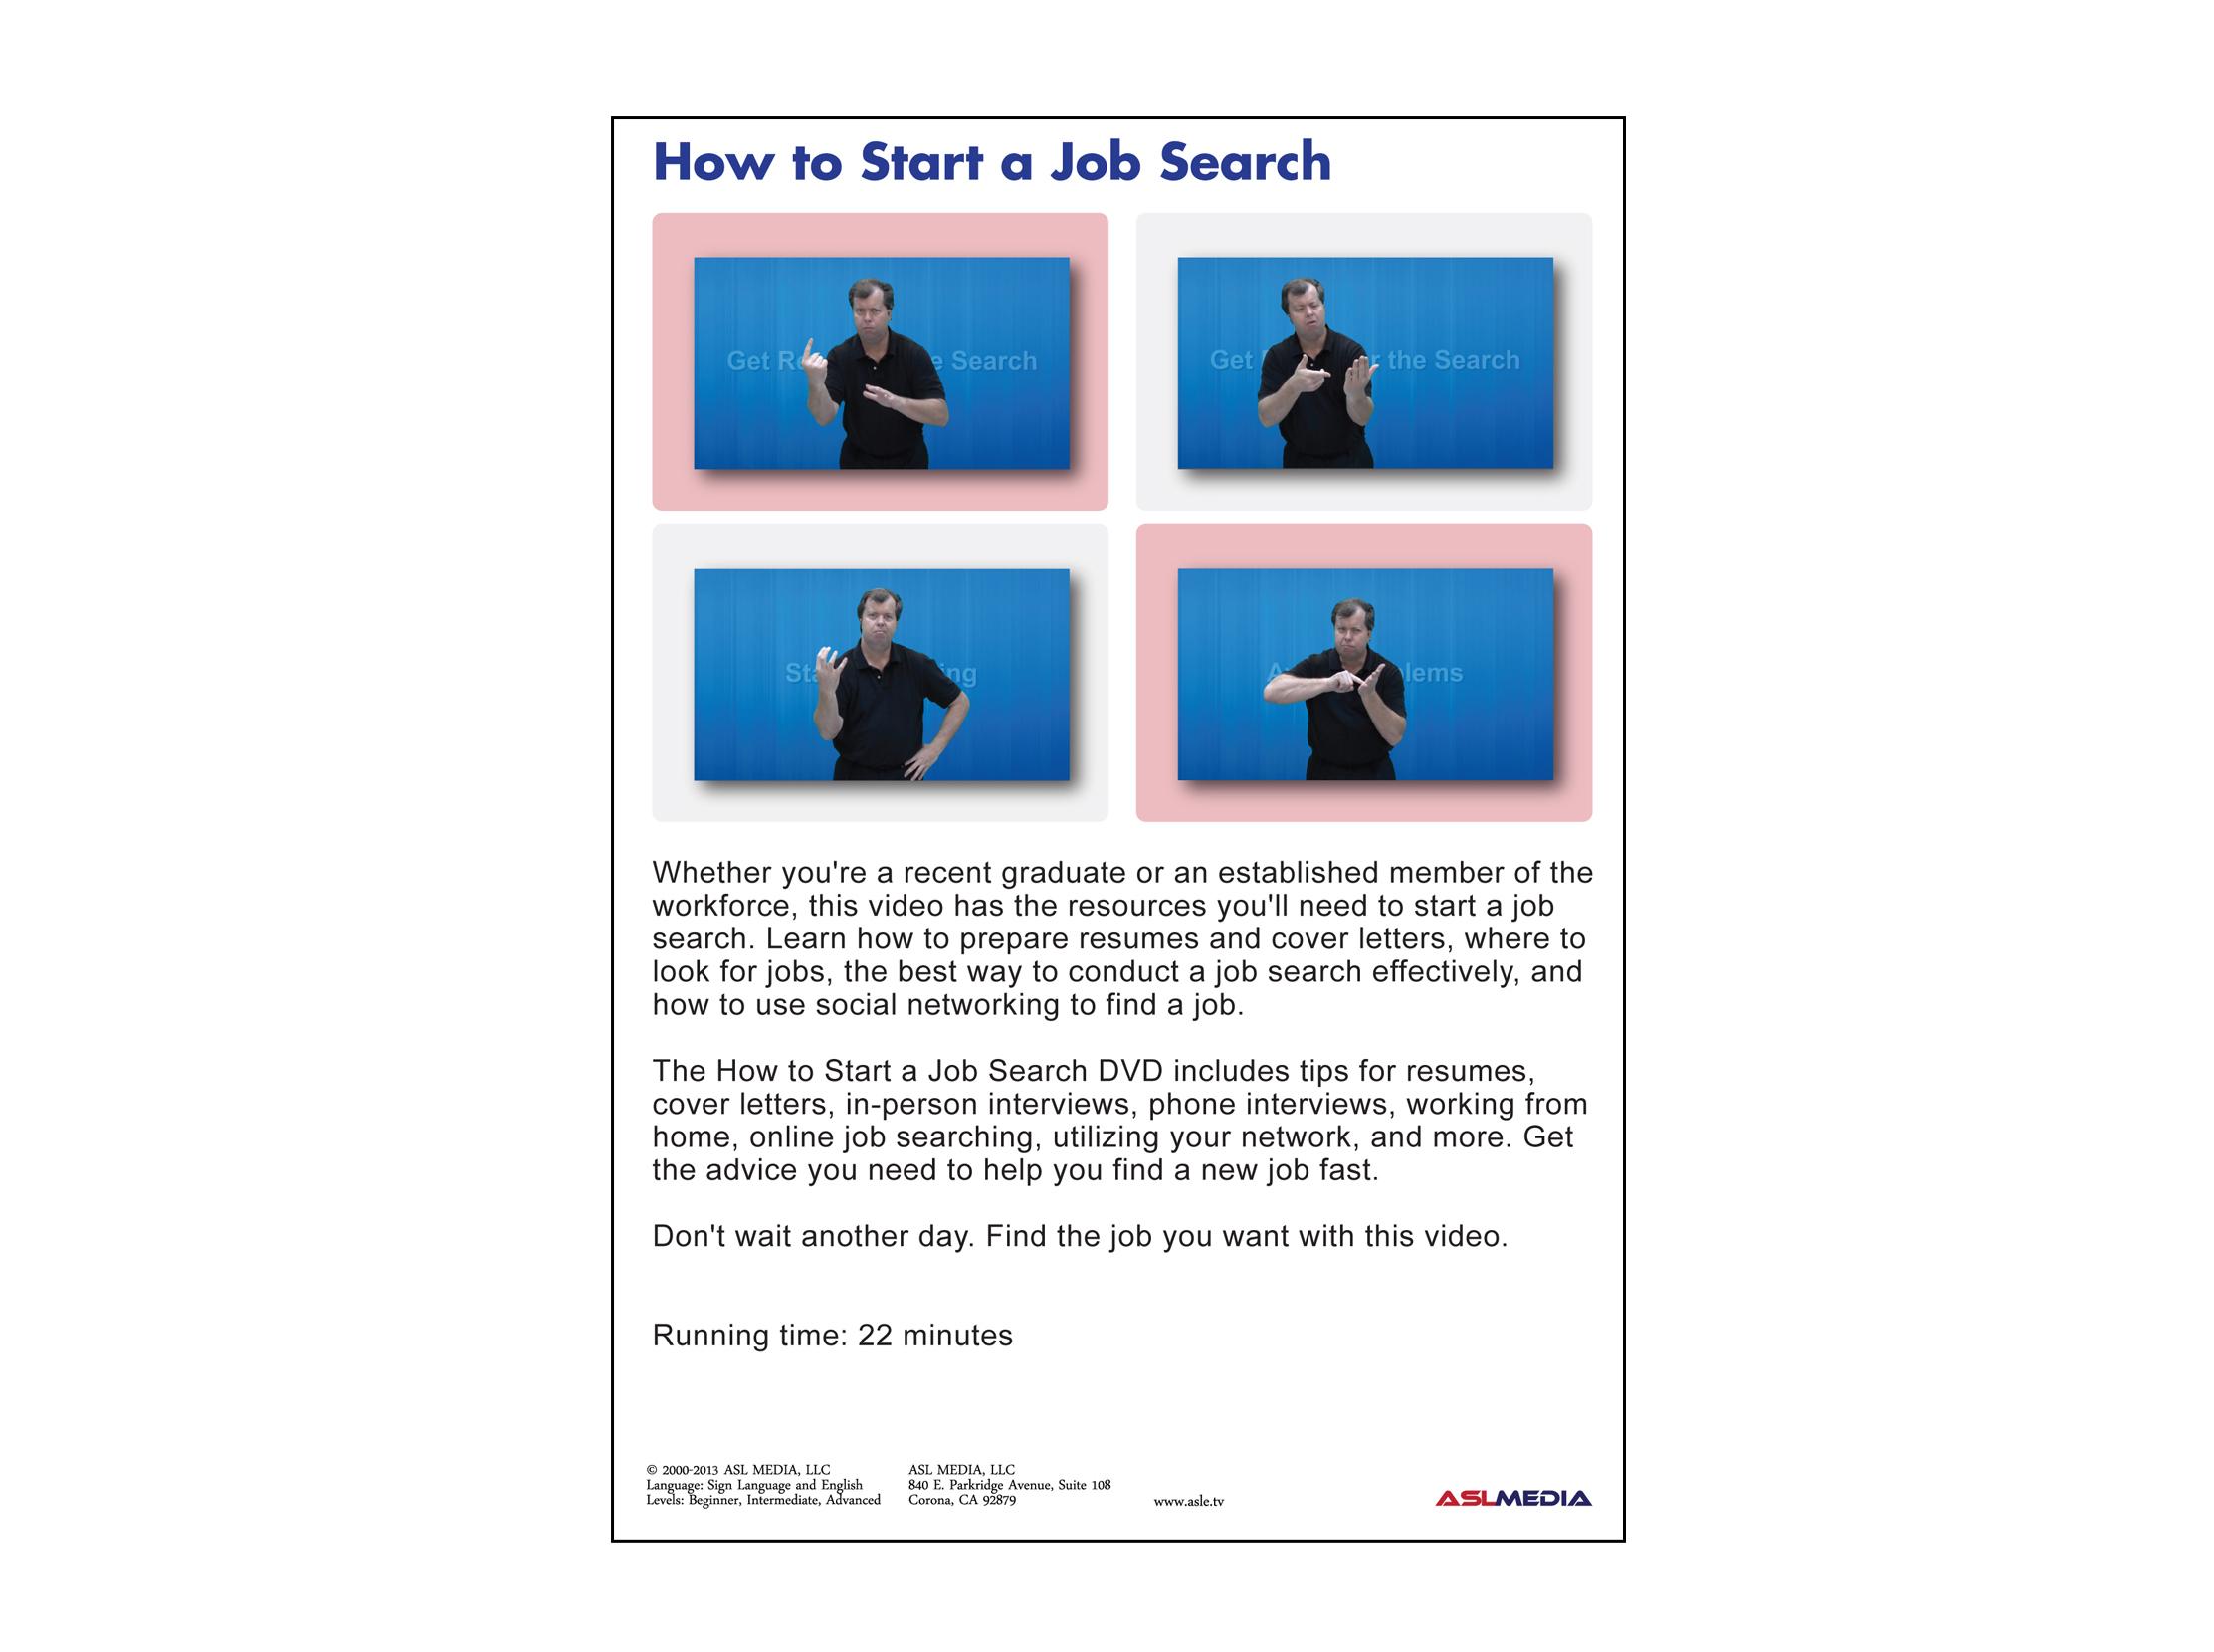 Job Success How to Start a Job Search - DVD (First Version) \u2014 ASL MEDIA